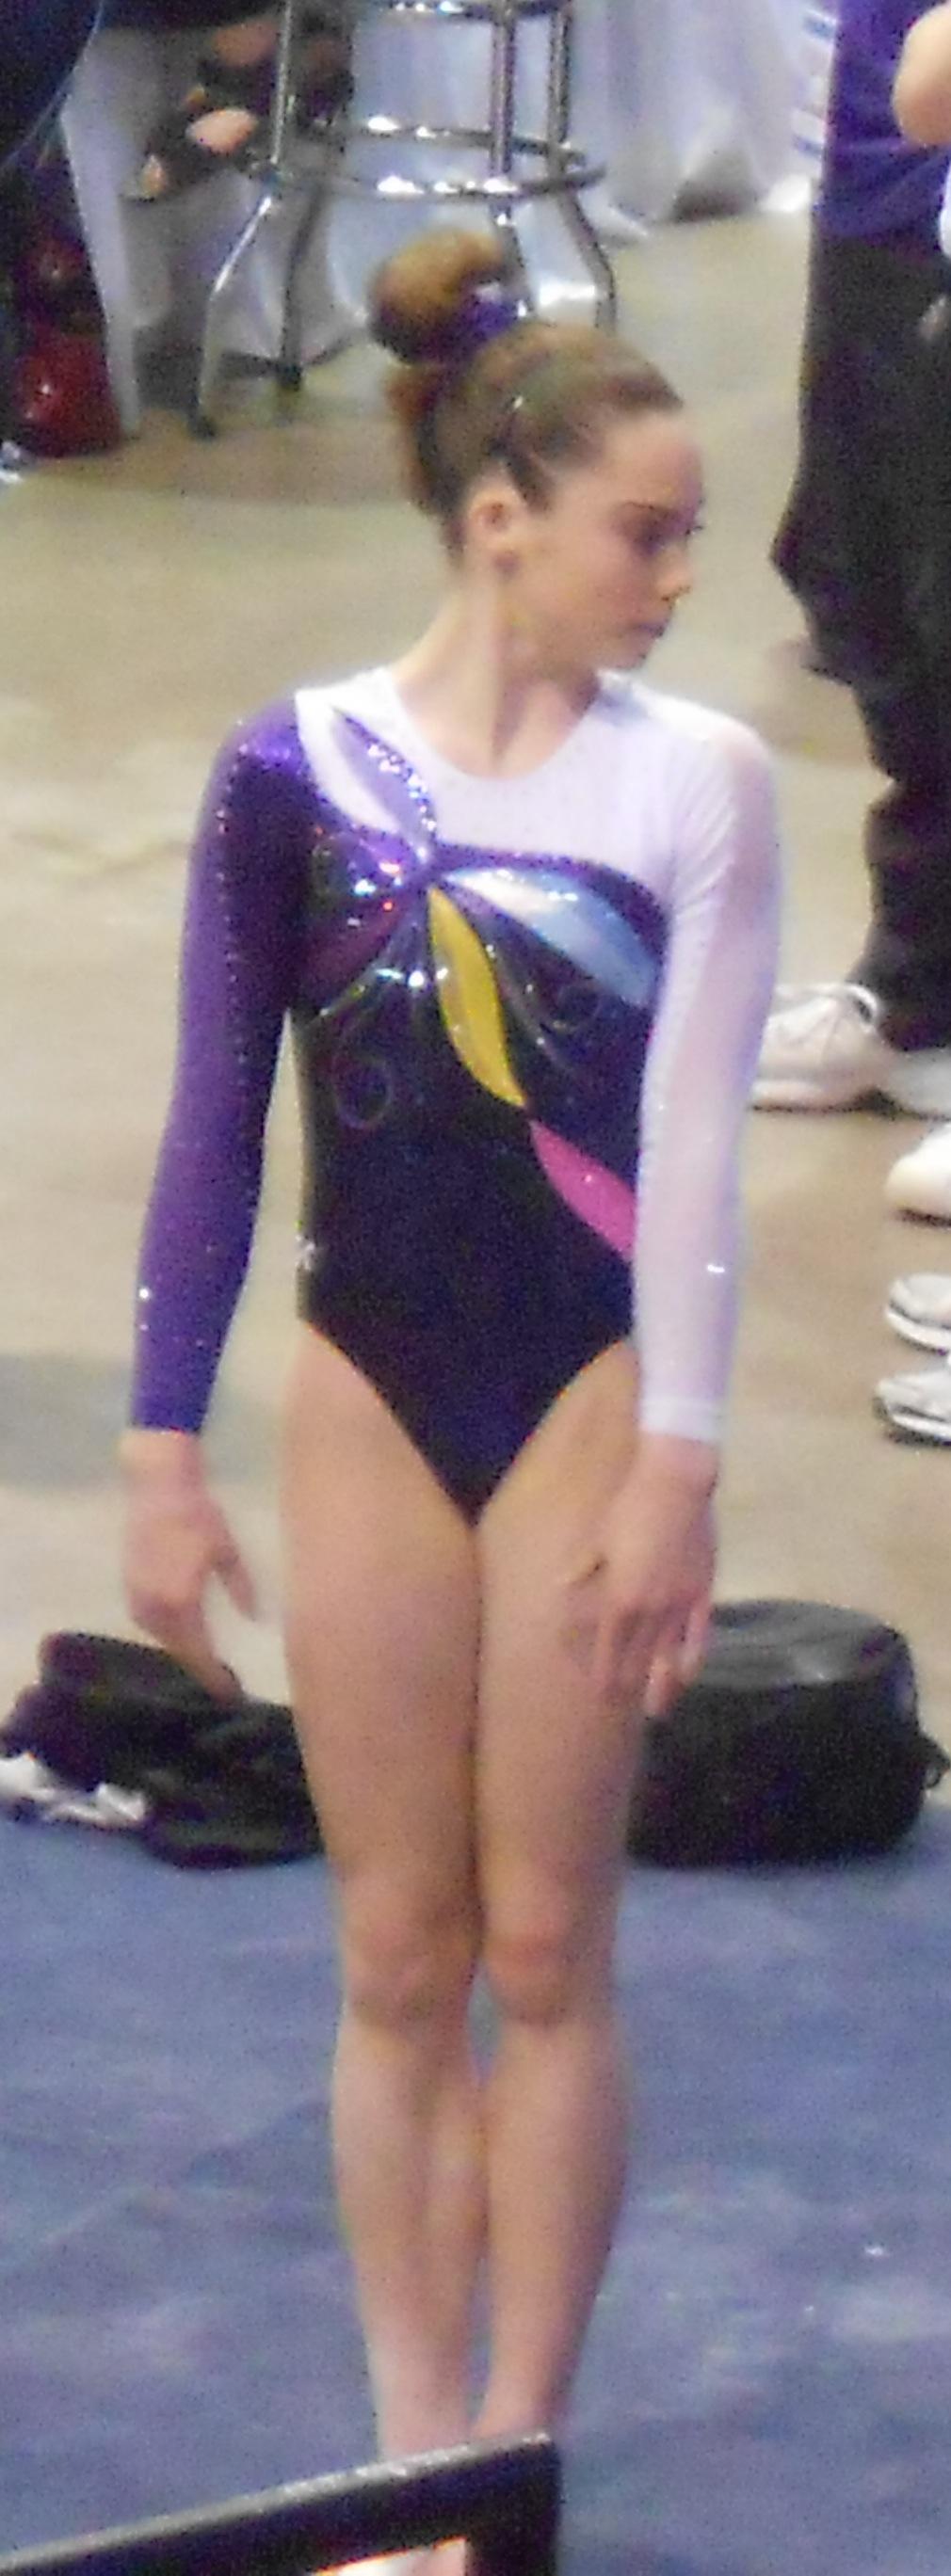 Maroney at the 2012 Secret U.S. Classic